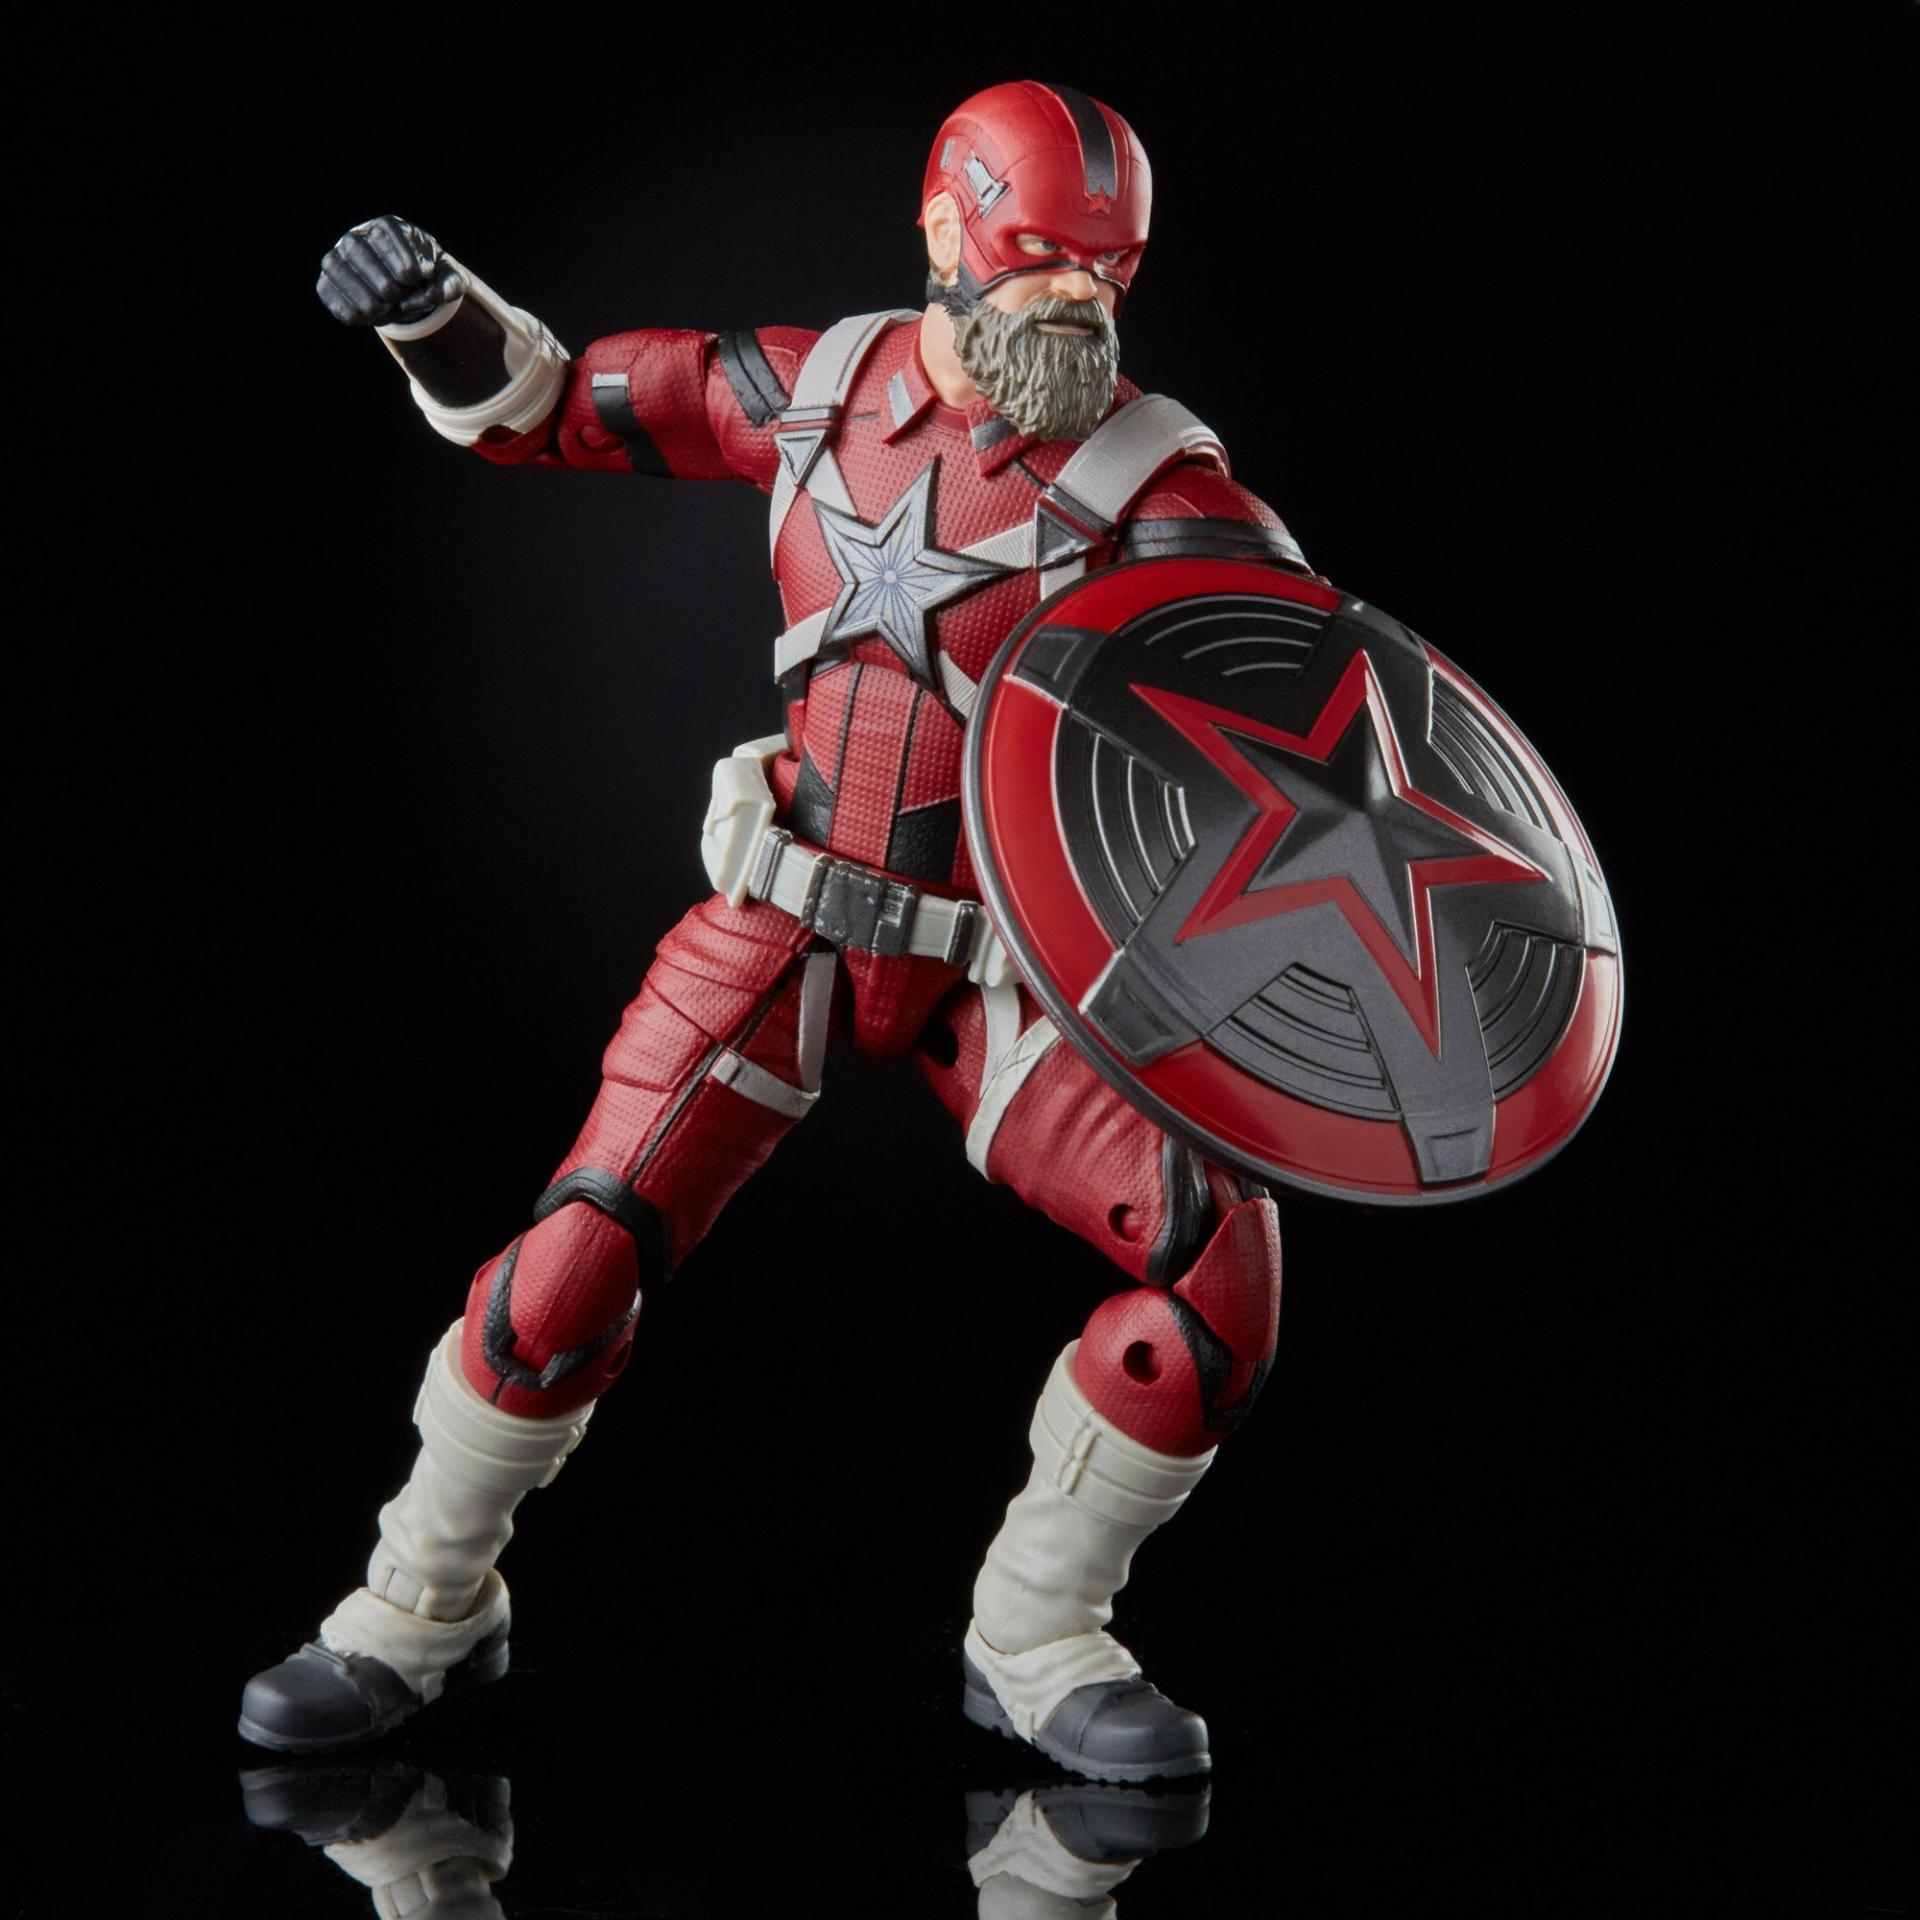 Marvel legends series hasbro red guardian melina vostkoff 2 pack8